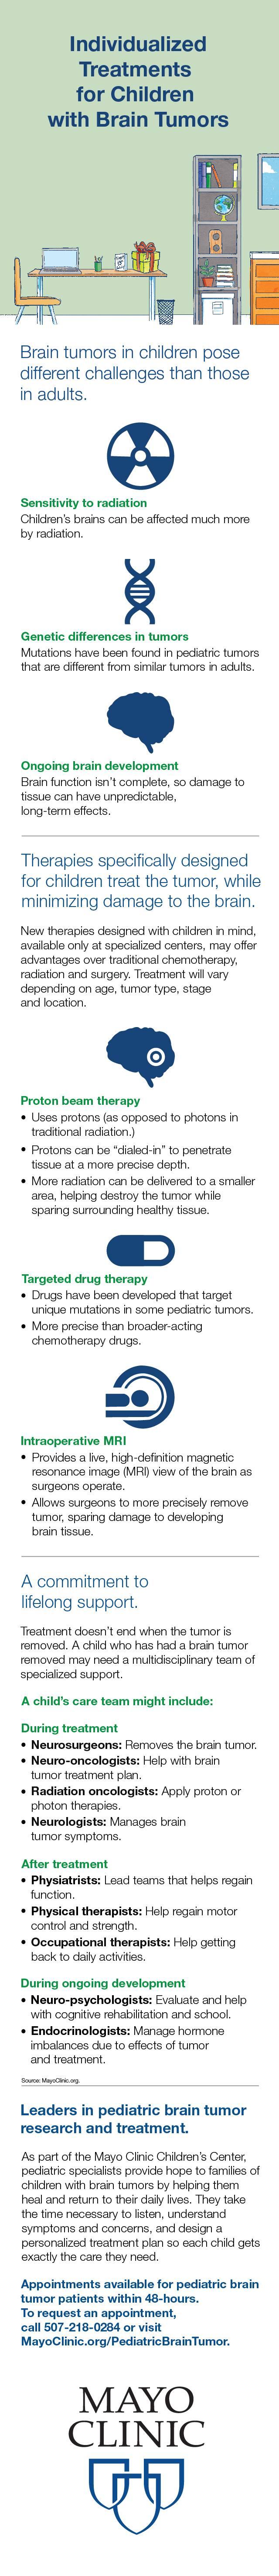 infographic describing pediatric brain tumors